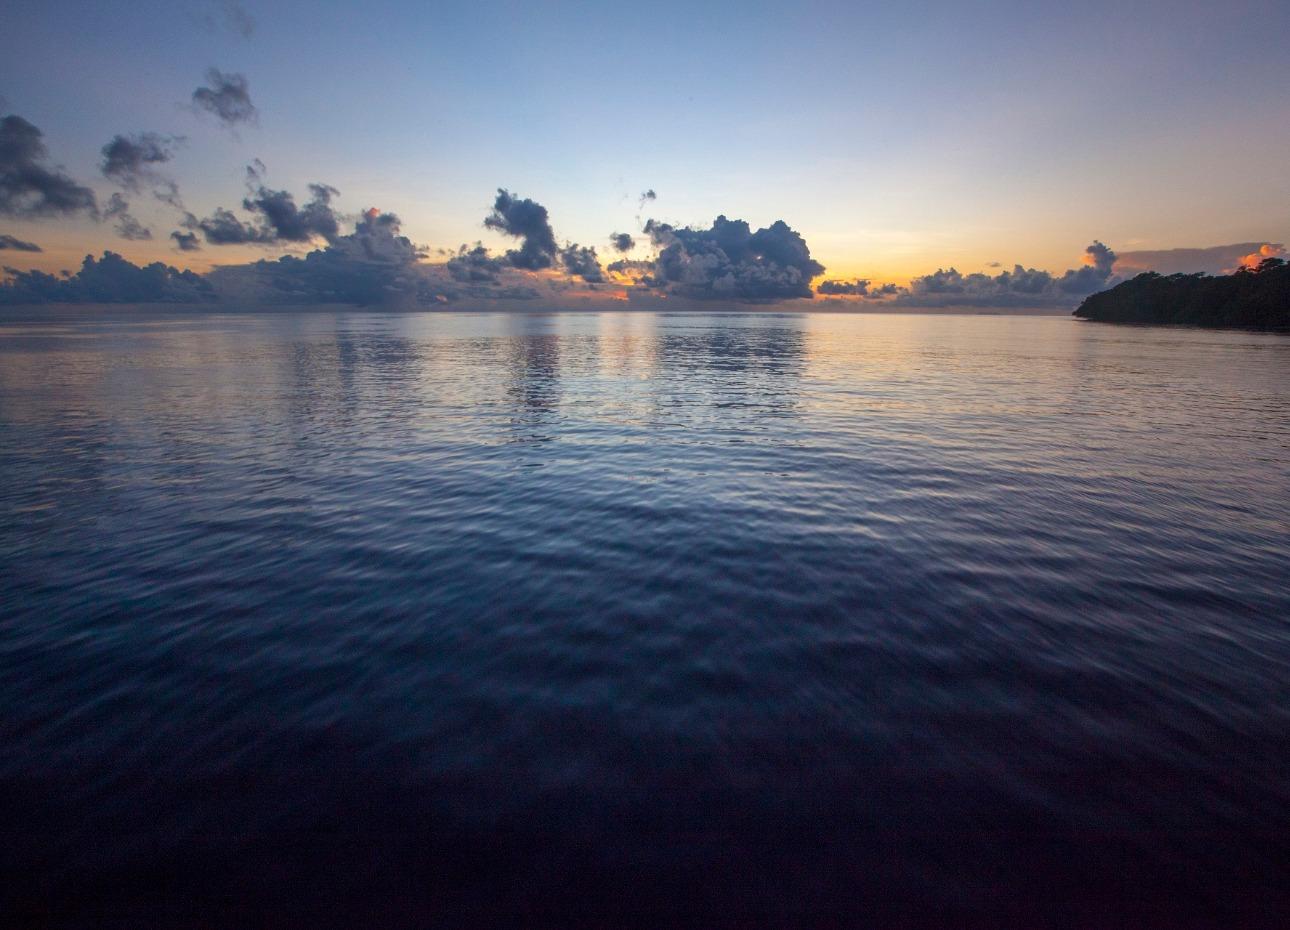 Solomon Islands, Sunrise, image